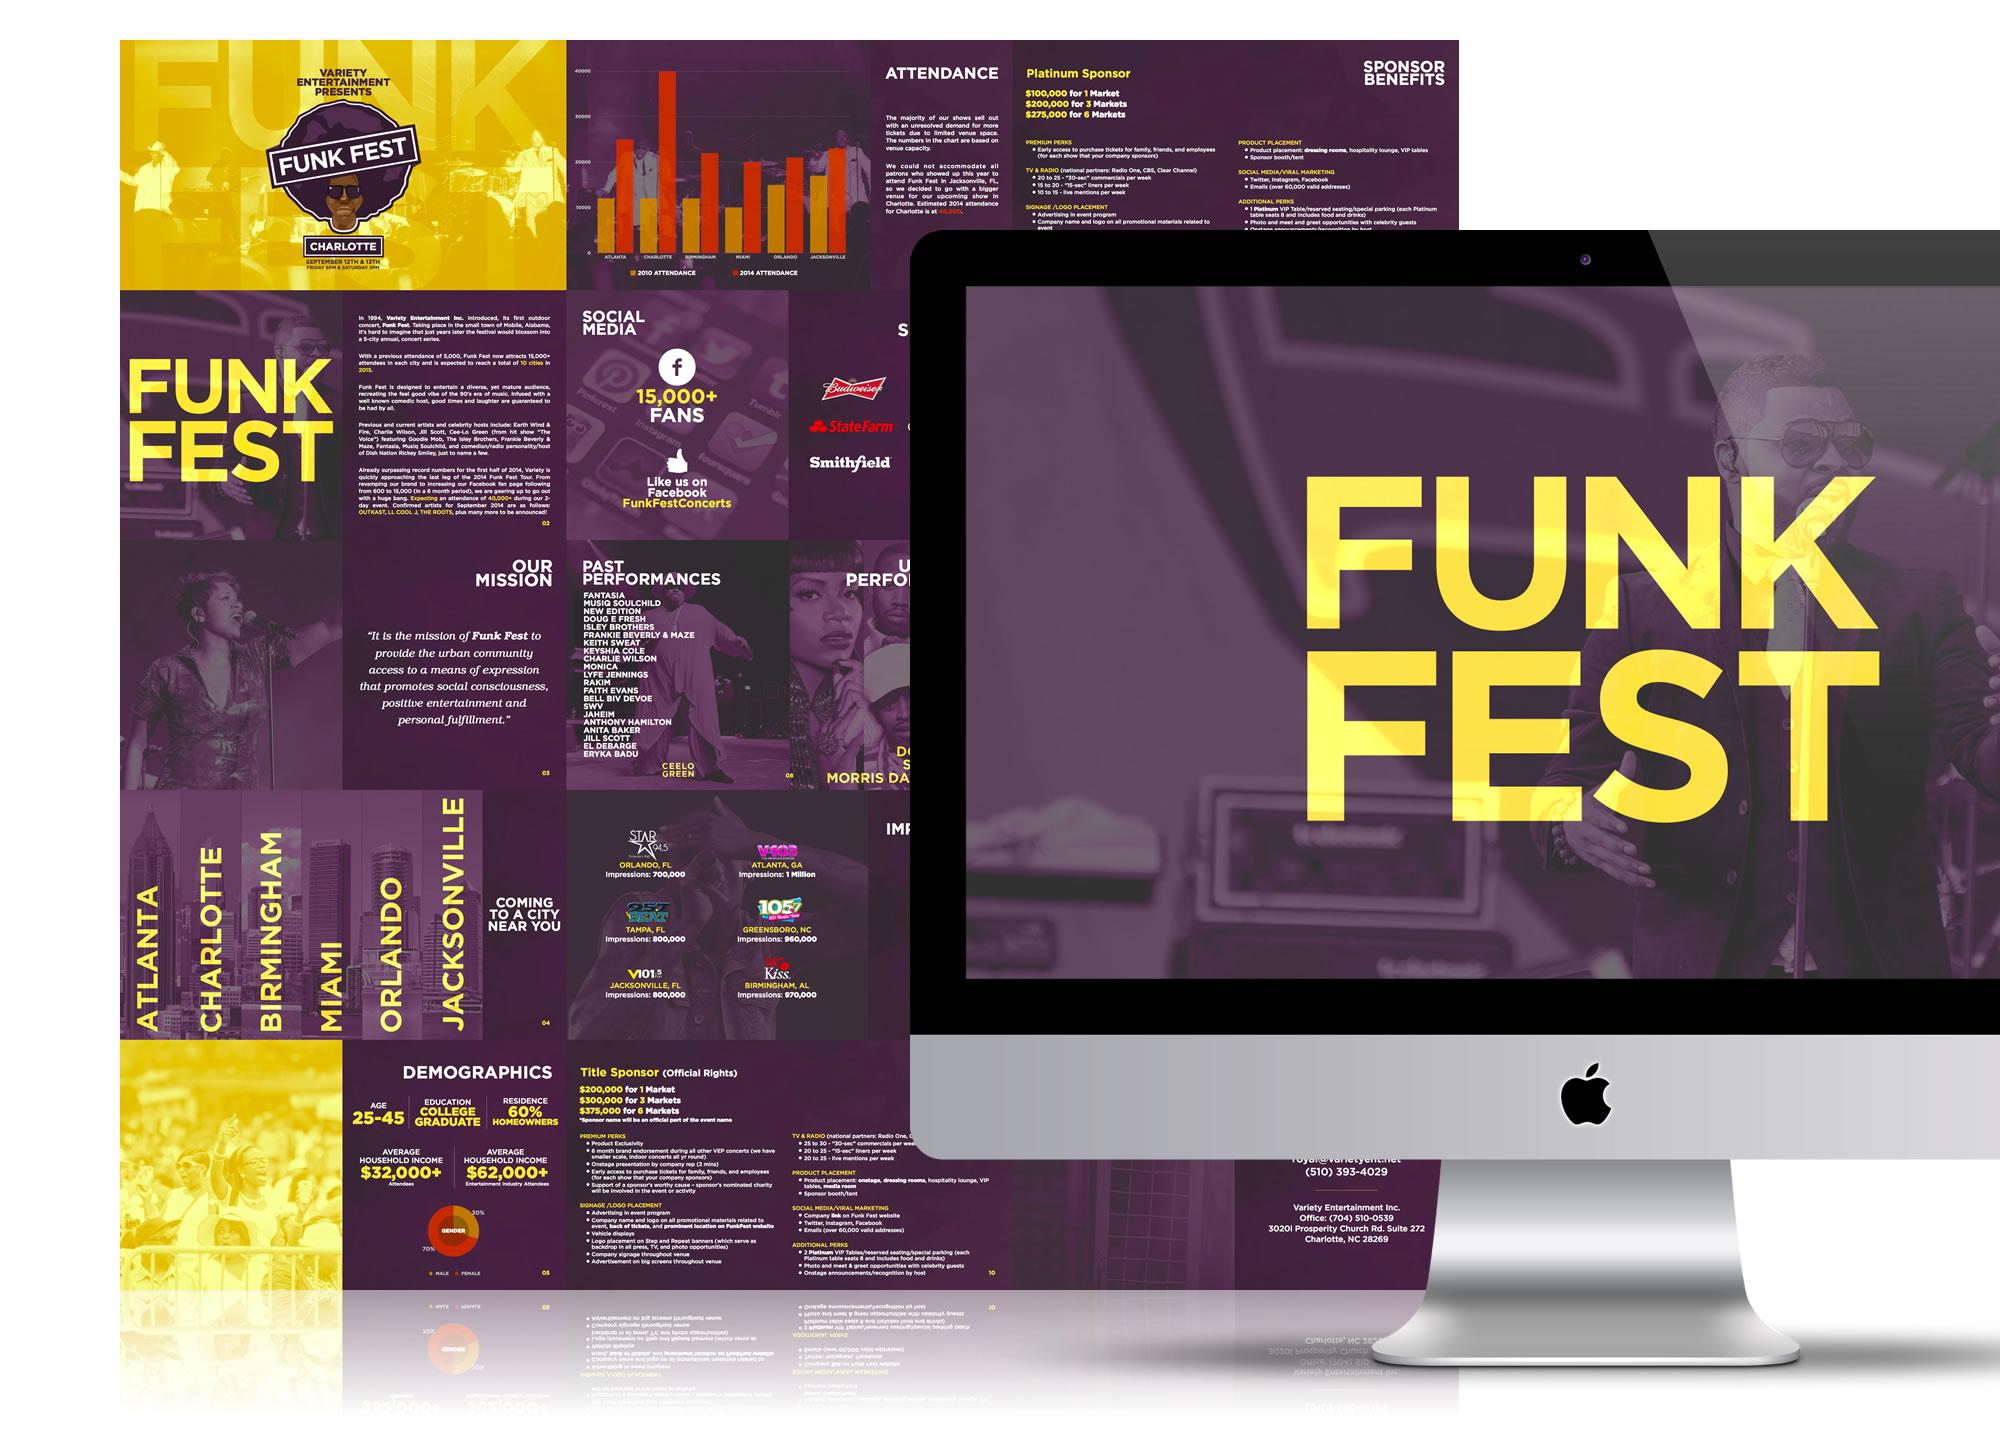 Funk Fest Sponsorship 1.0